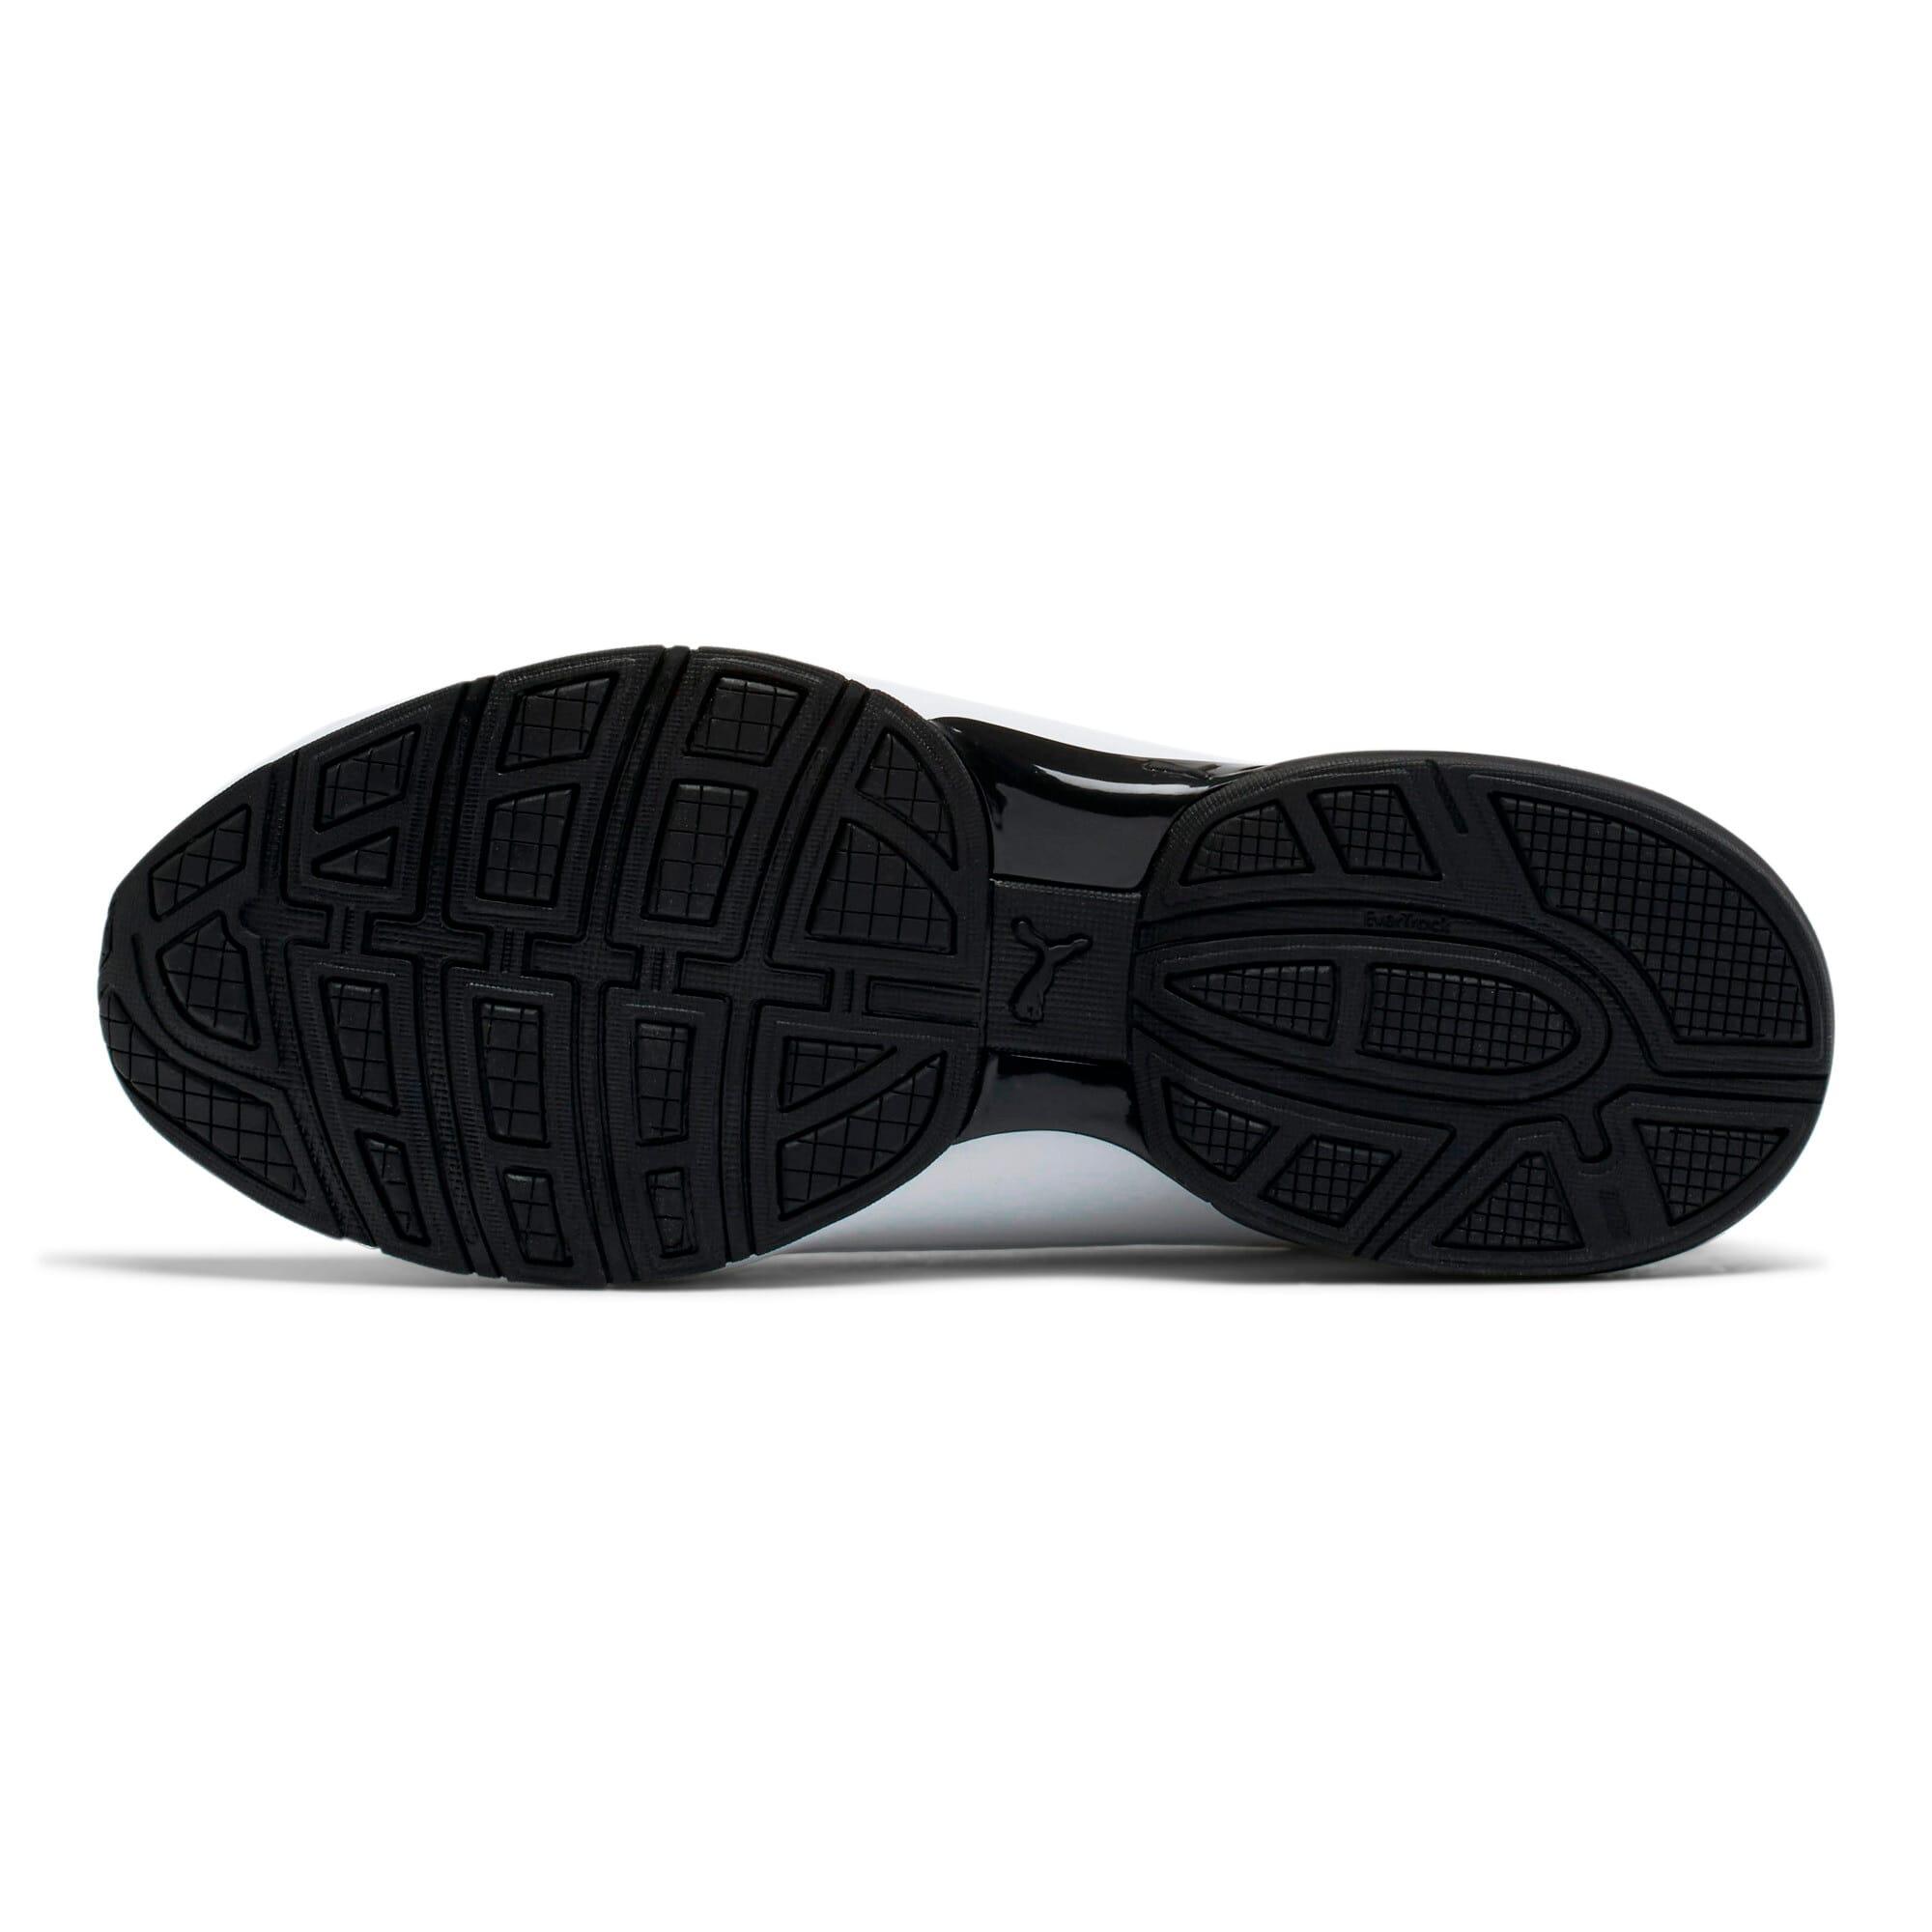 Thumbnail 4 of Viz Runner Men's Running Shoes, Puma White-Puma Black, medium